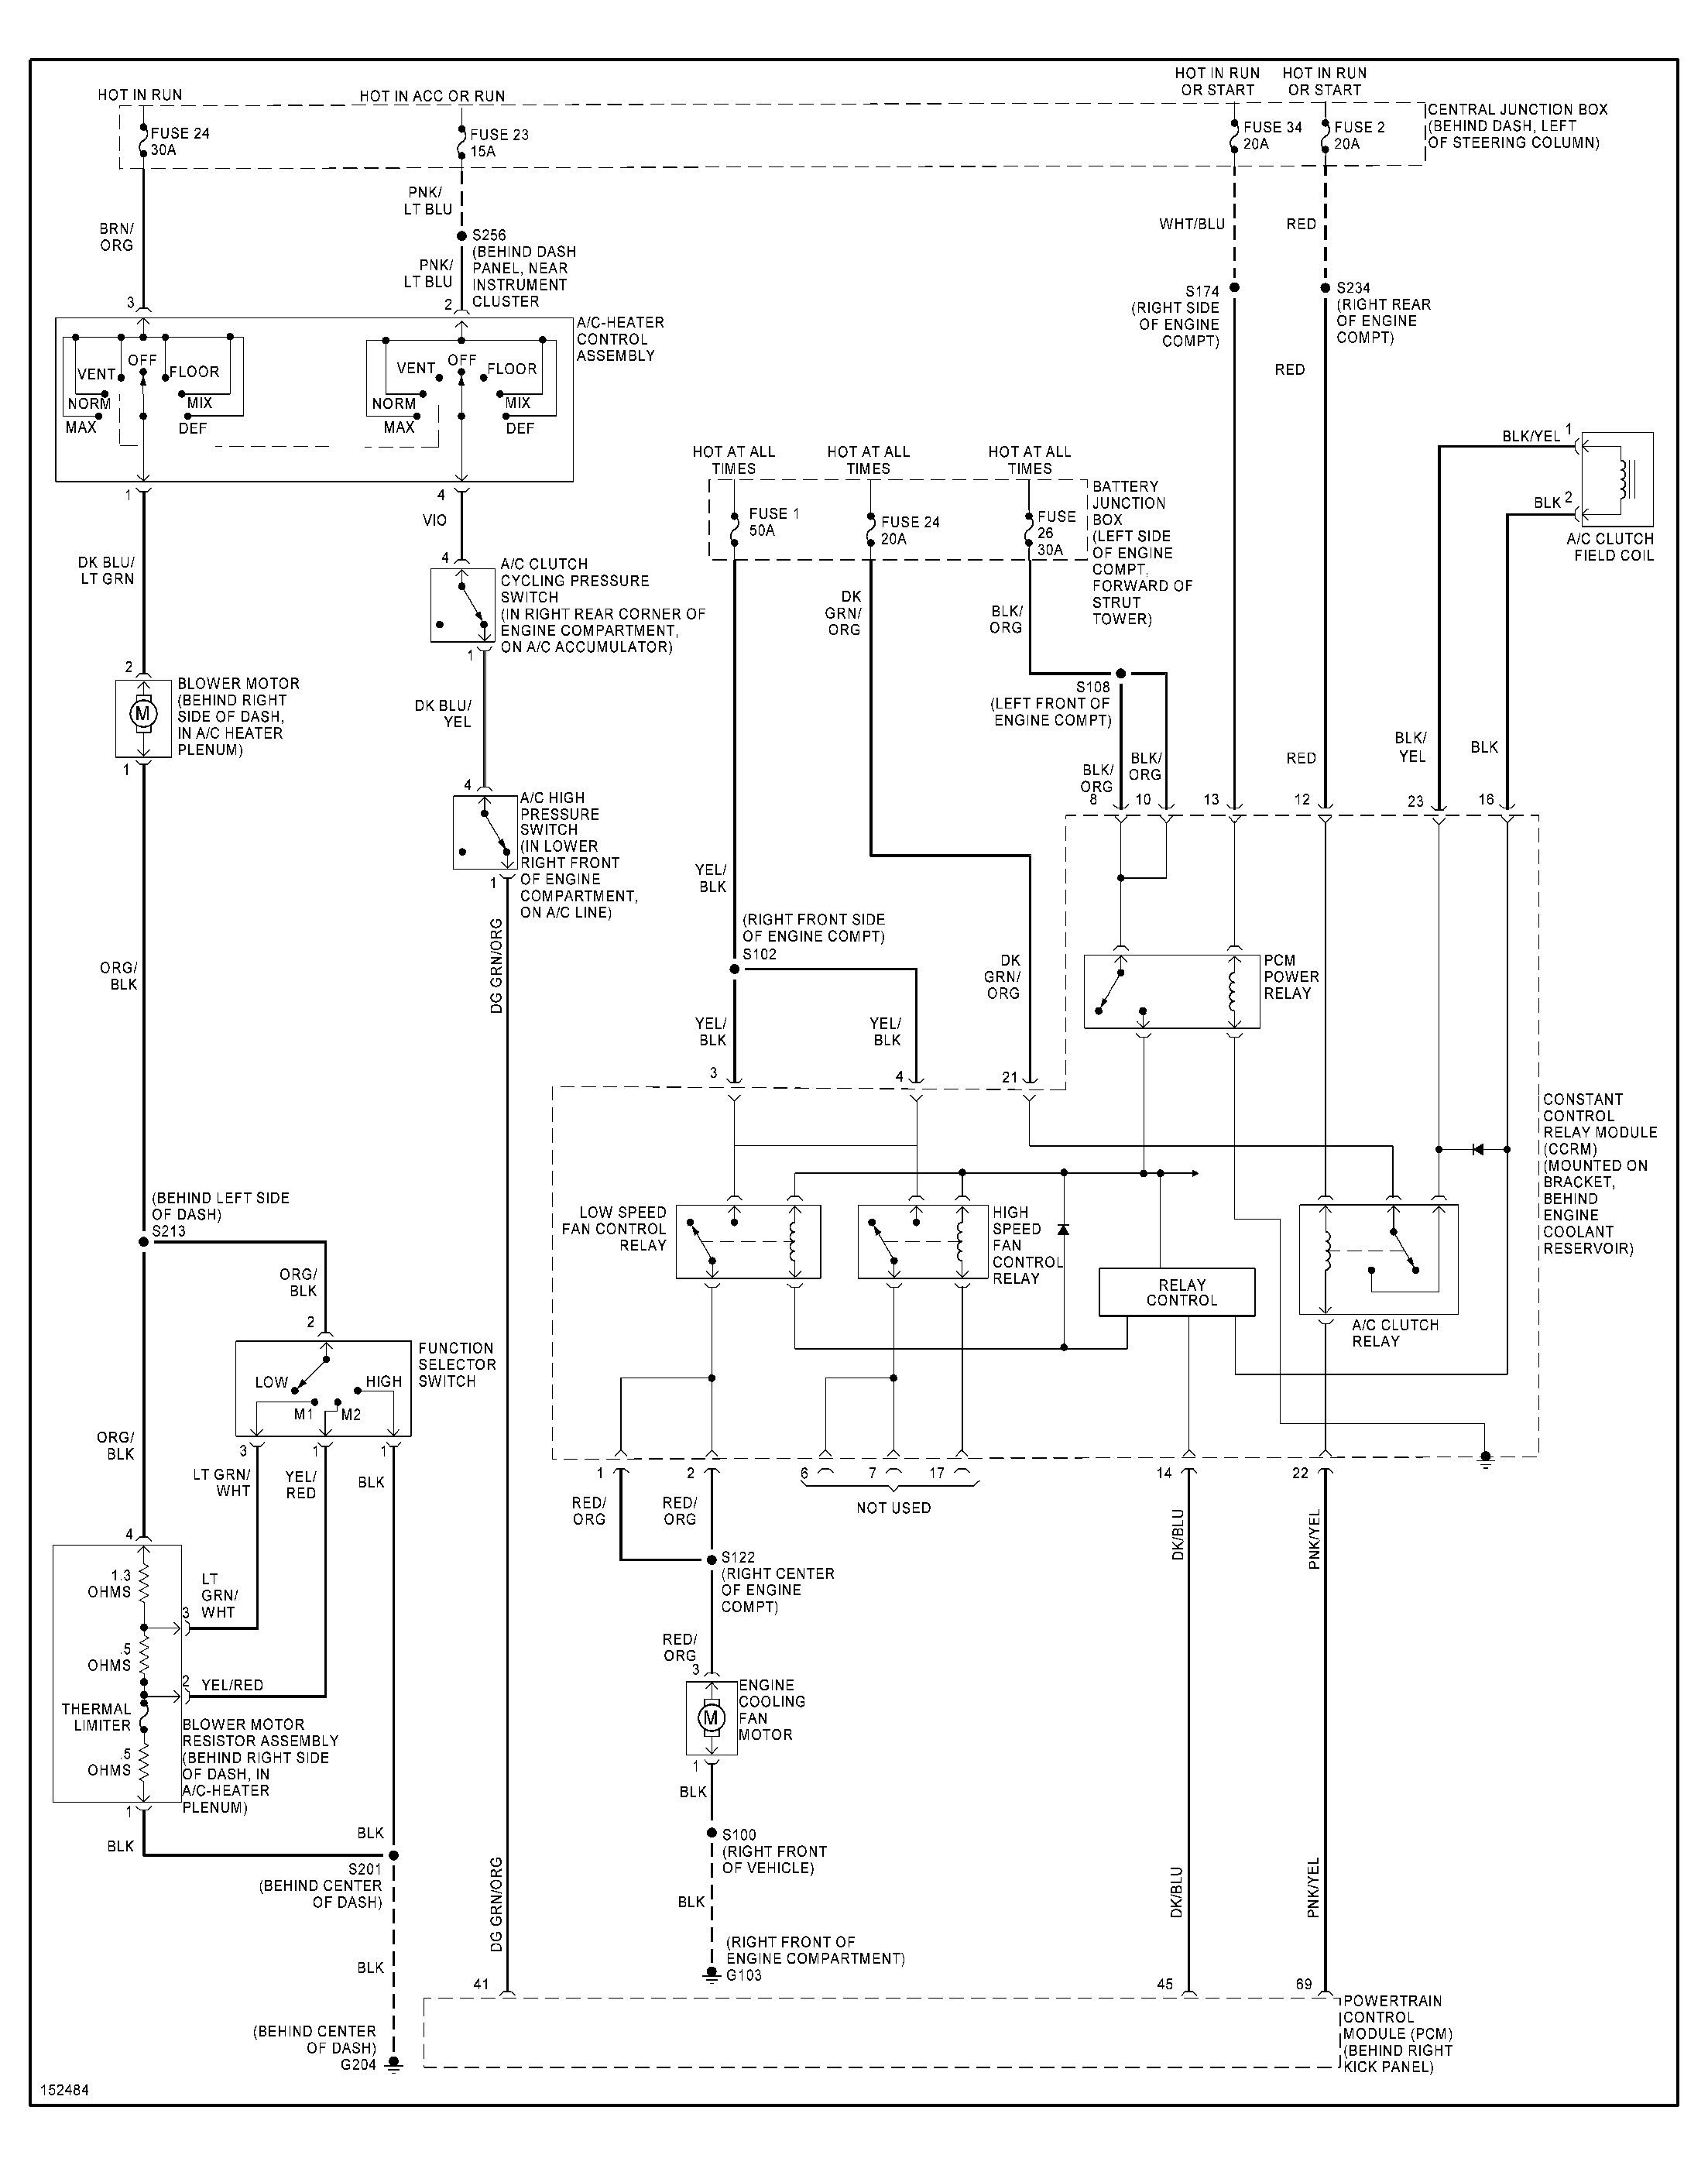 FM_3372] Engine Pressure Switch Wiring DiagramXortanet Anth Weasi Pendu Xlexi Egre Hapolo Ical Intap Nuvit Xolia Inama  Mohammedshrine Librar Wiring 101